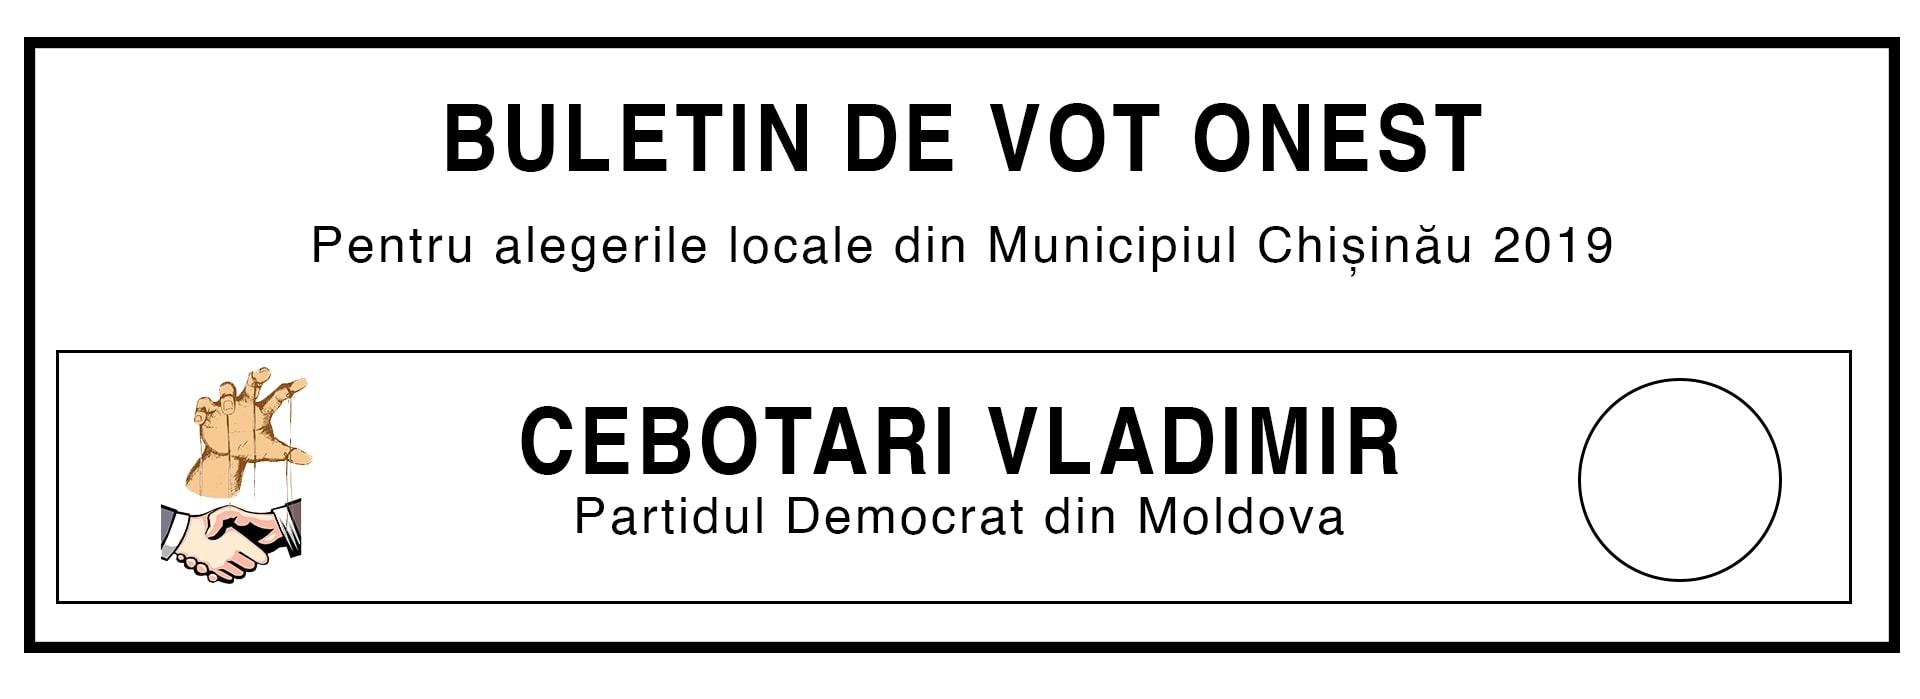 Cebotari Vladimir